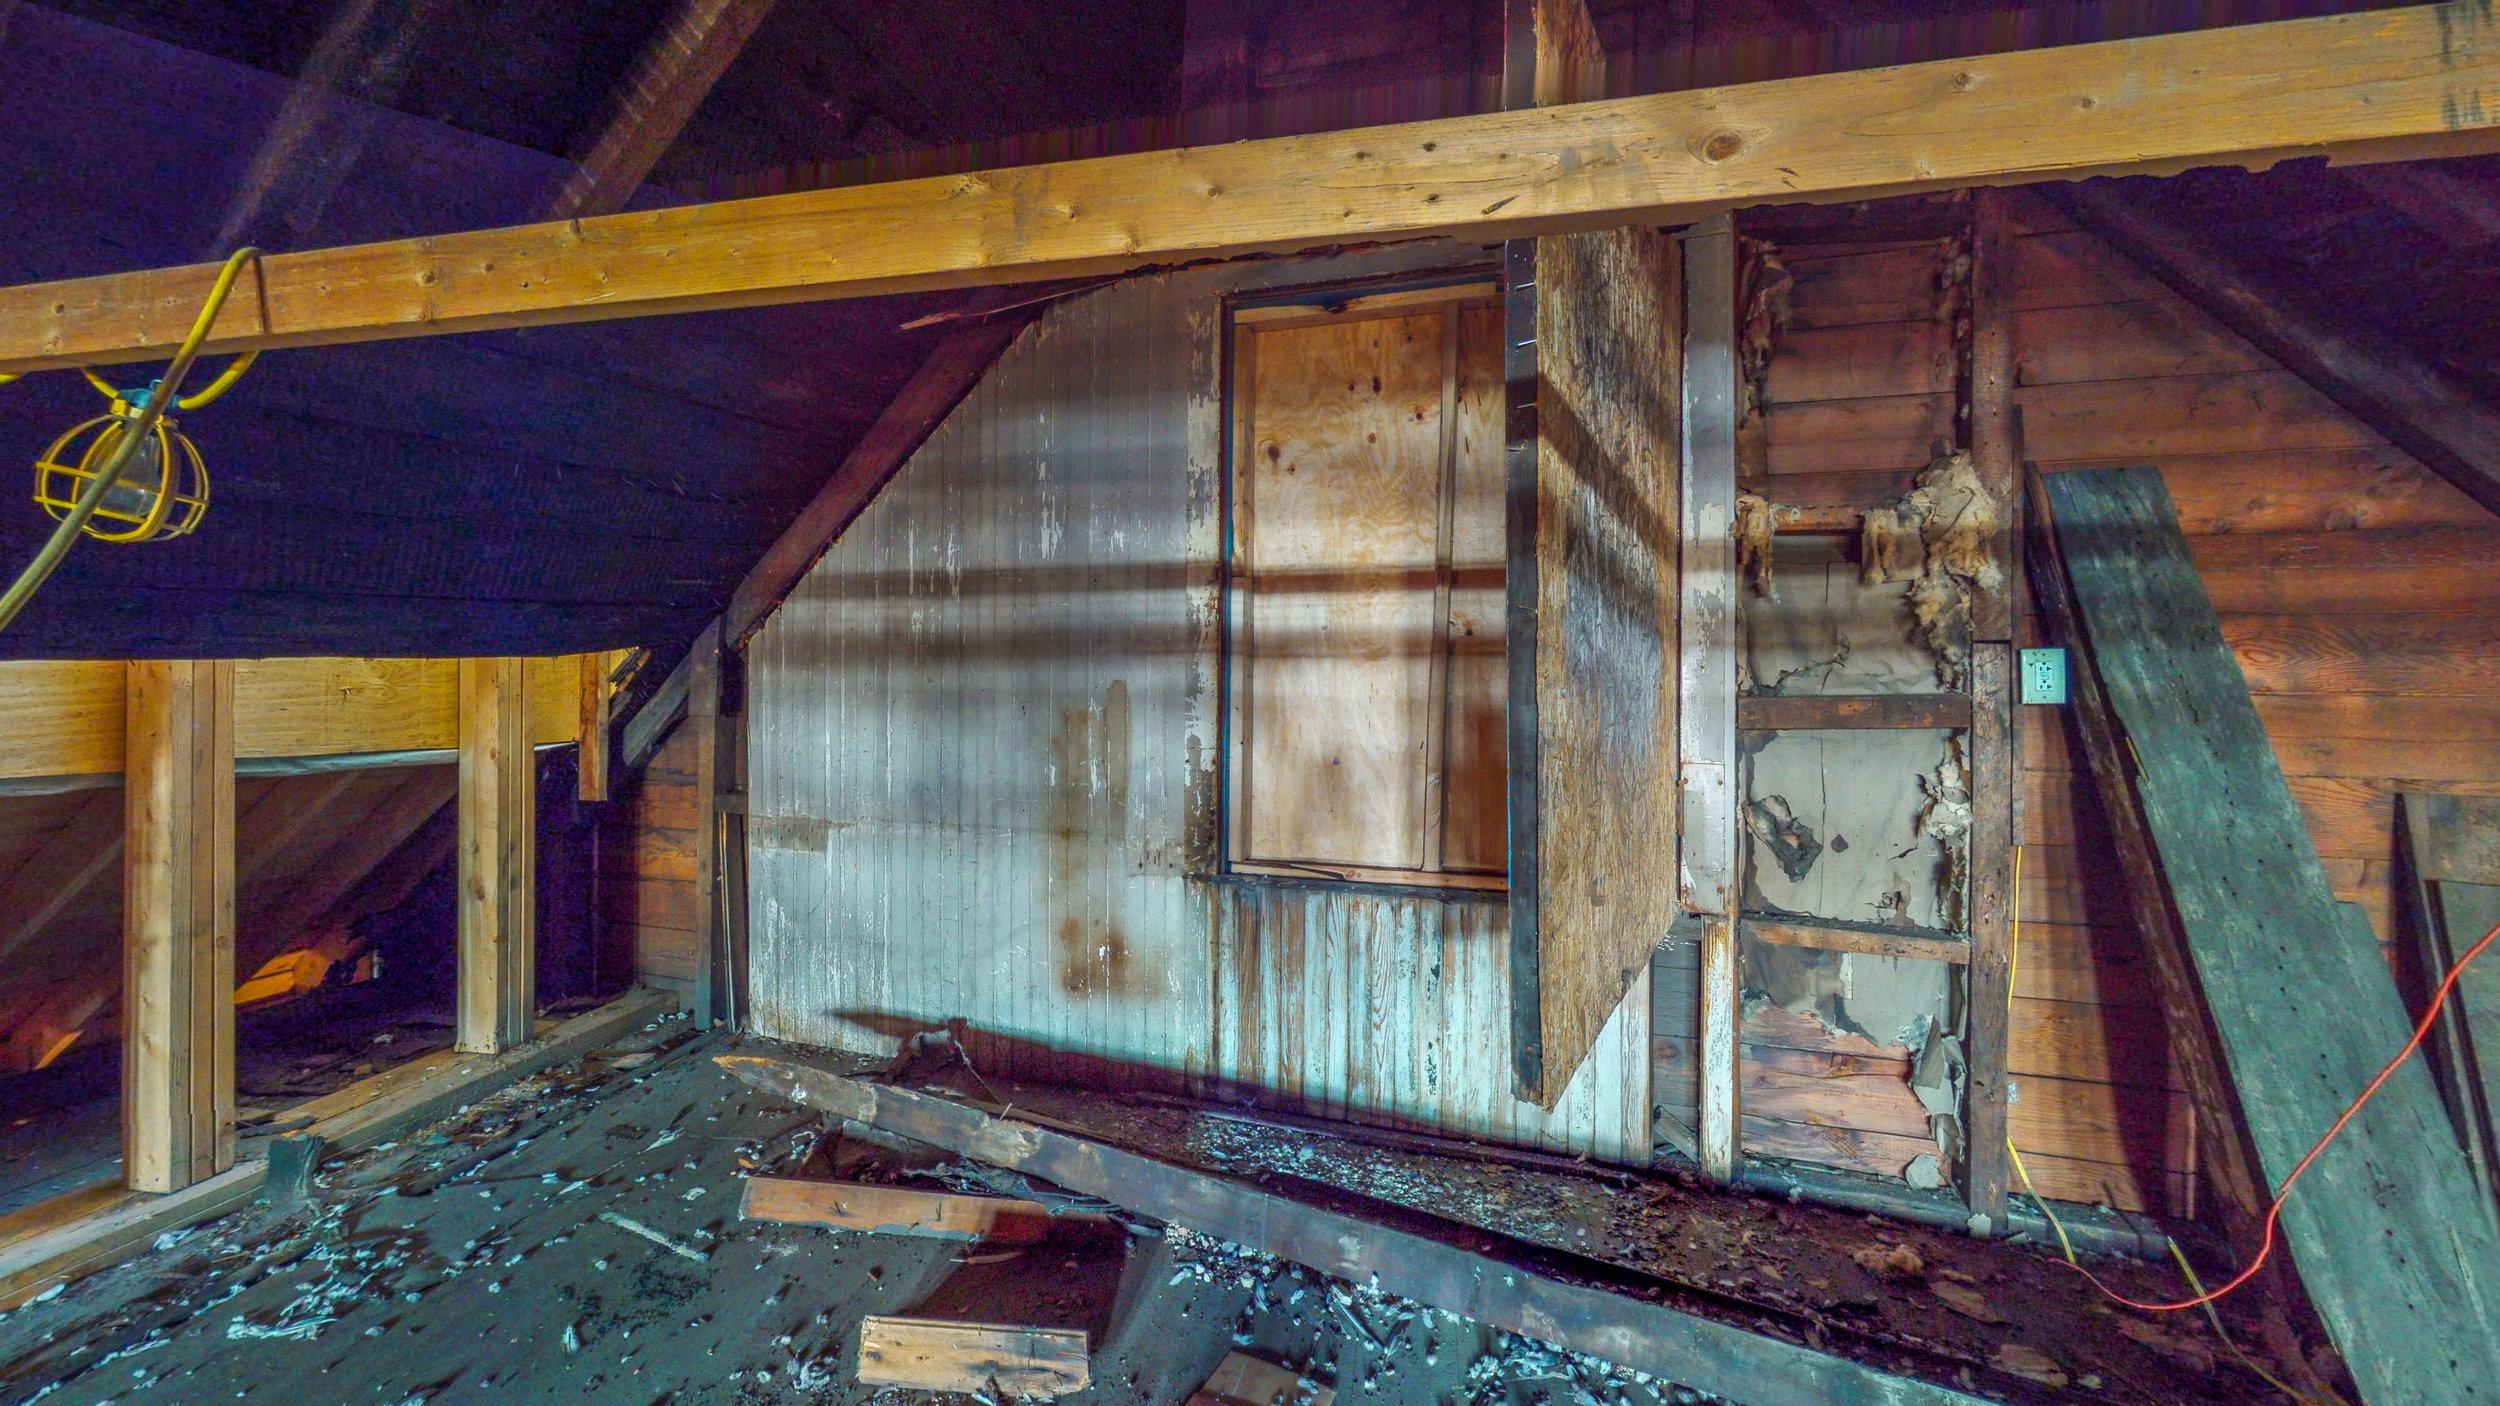 The-Van-Ostrande-Radliff-House-at-48-Hudson-08292019_131822.jpg